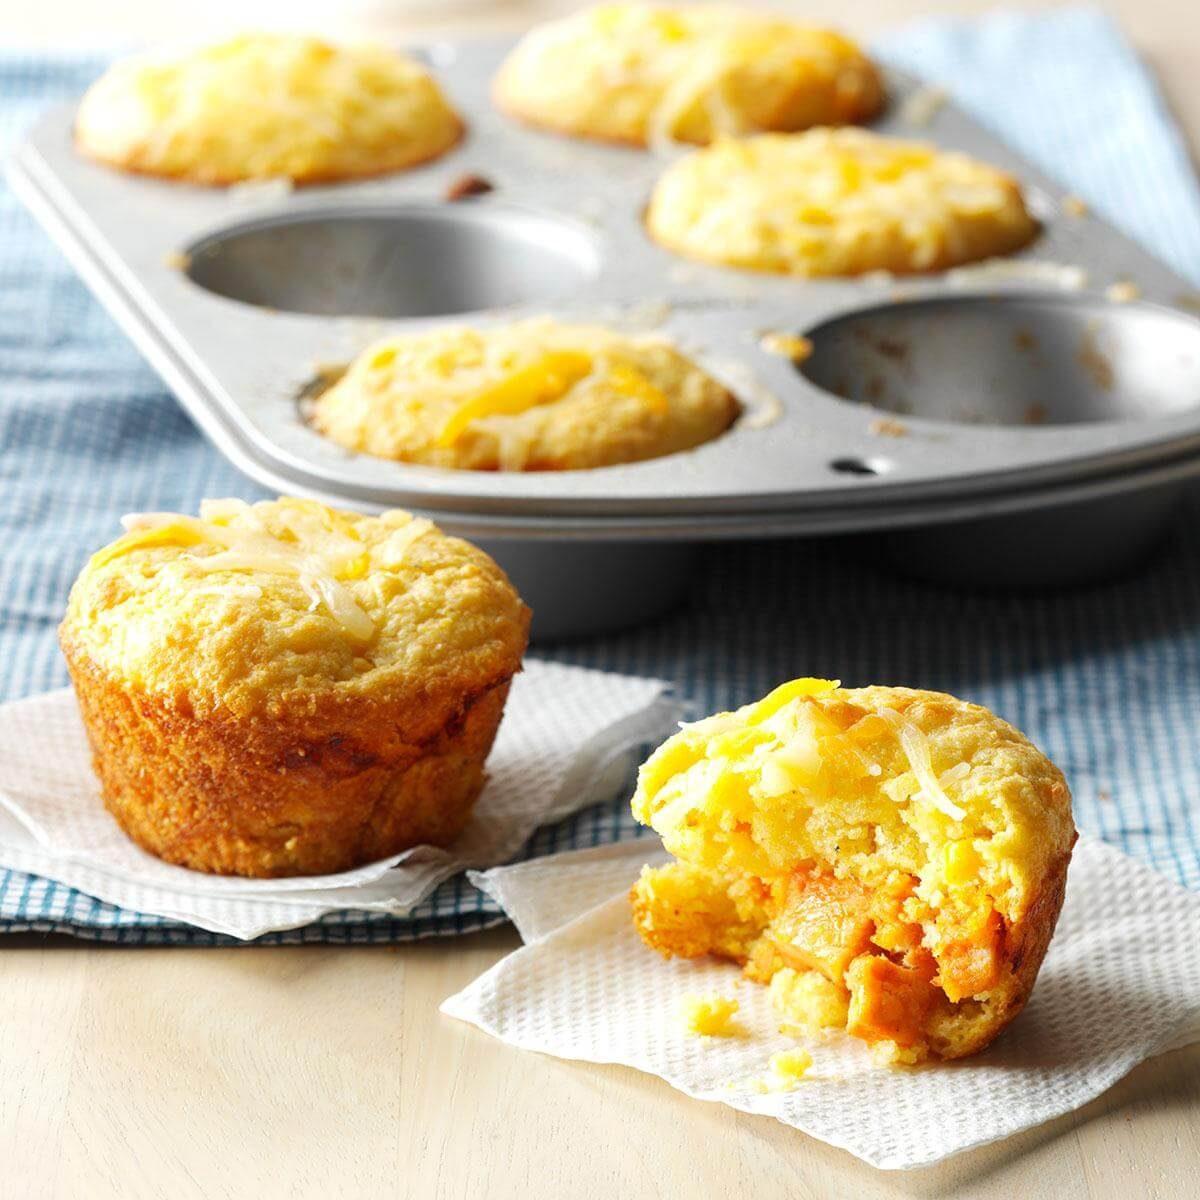 Muffin-Tin Tamale Cakes